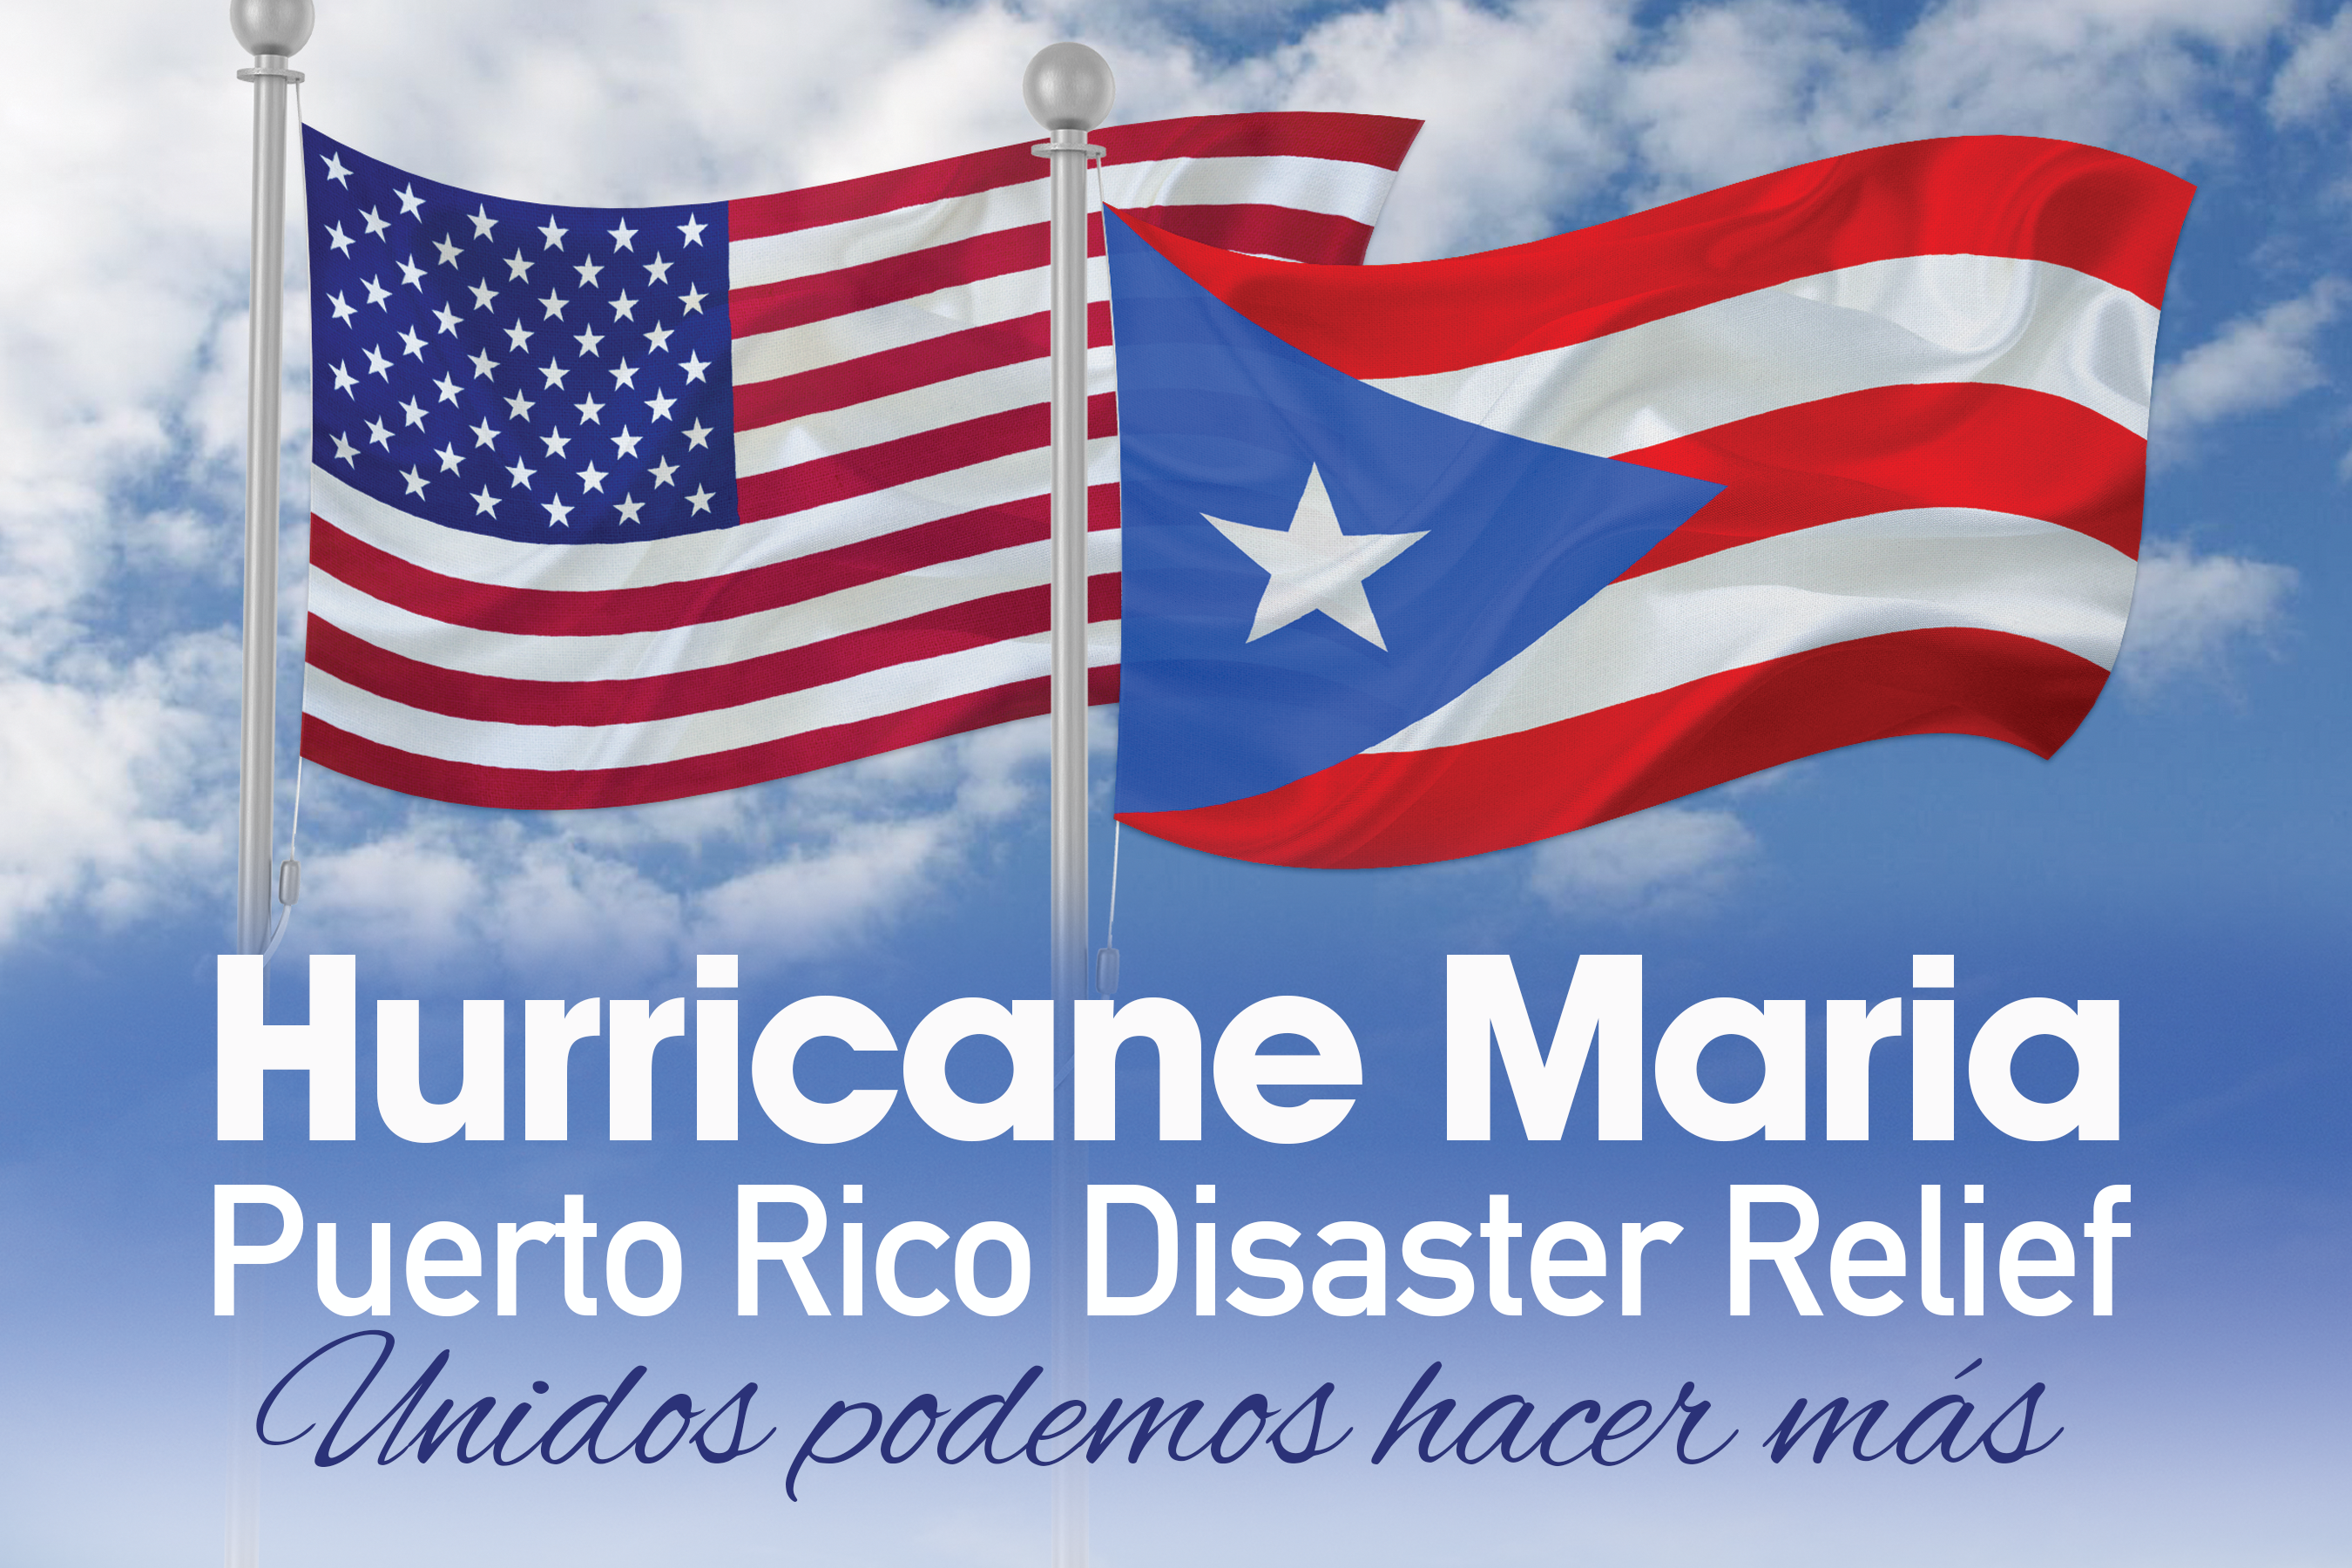 Hurricane Maria Puerto Rico Disaster